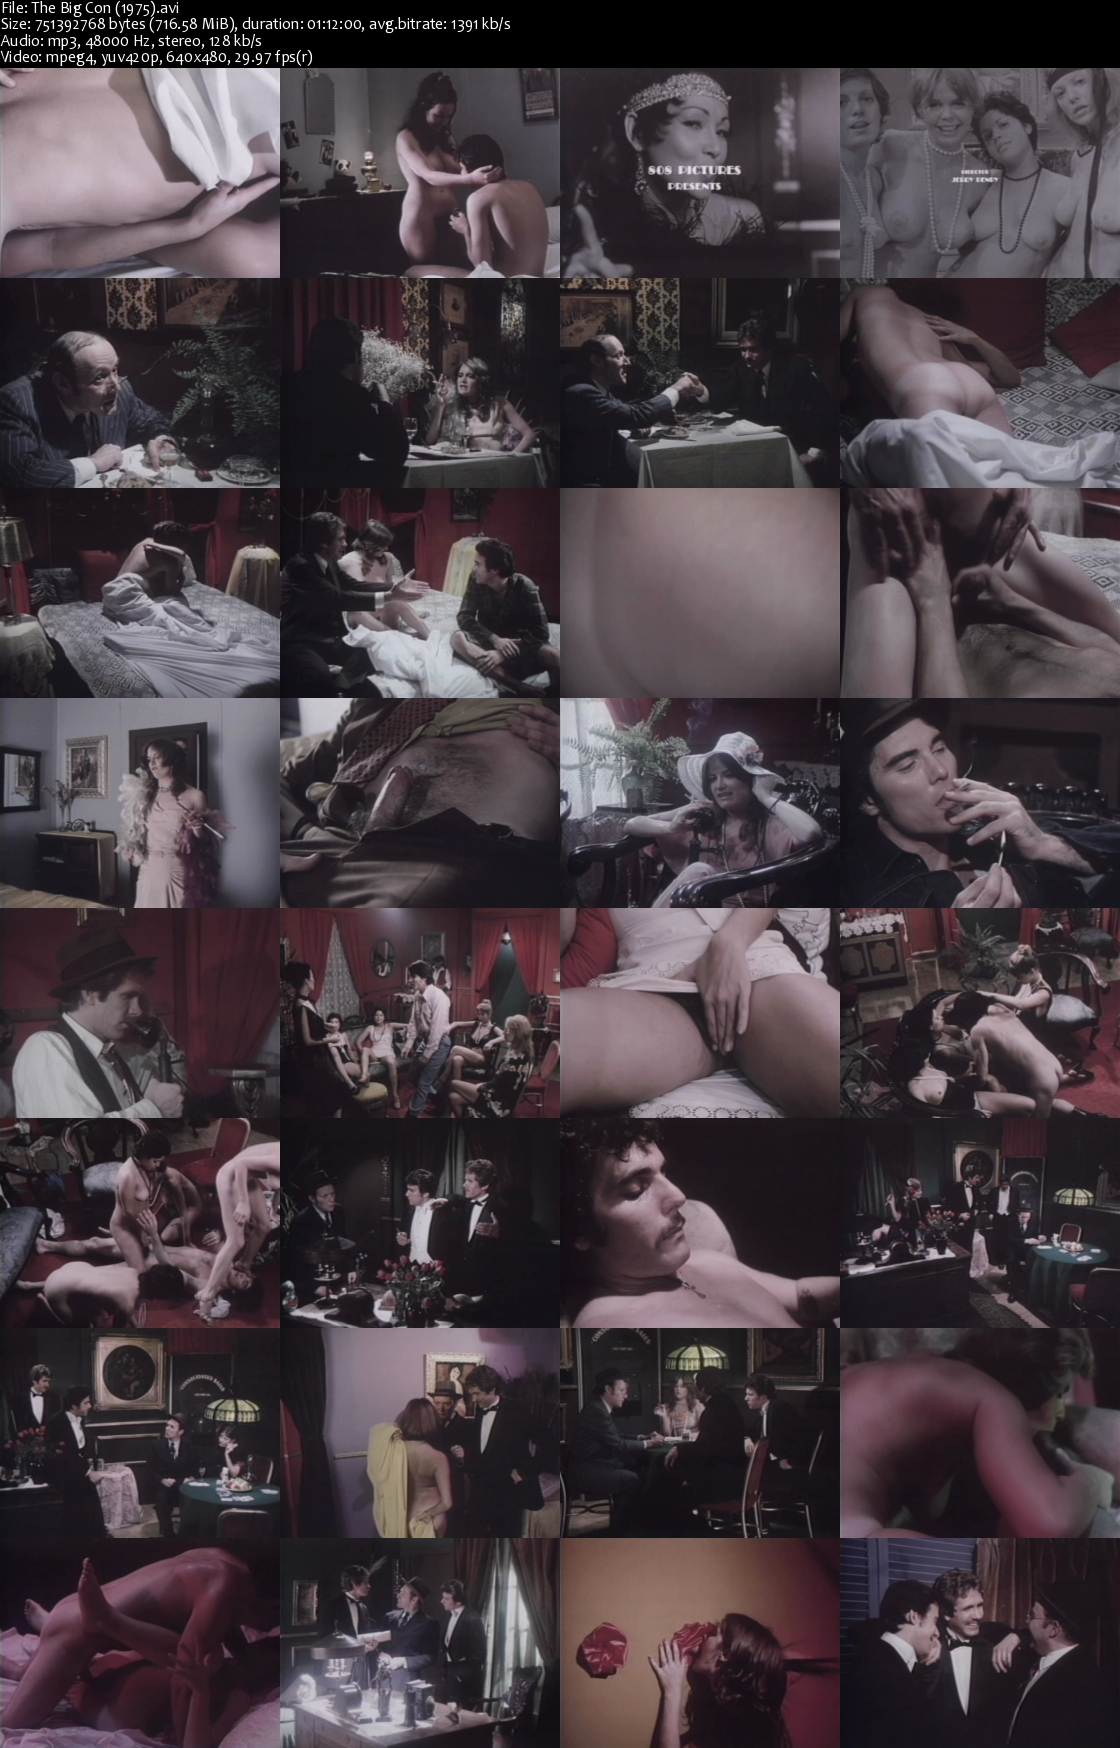 kino-seks-1975